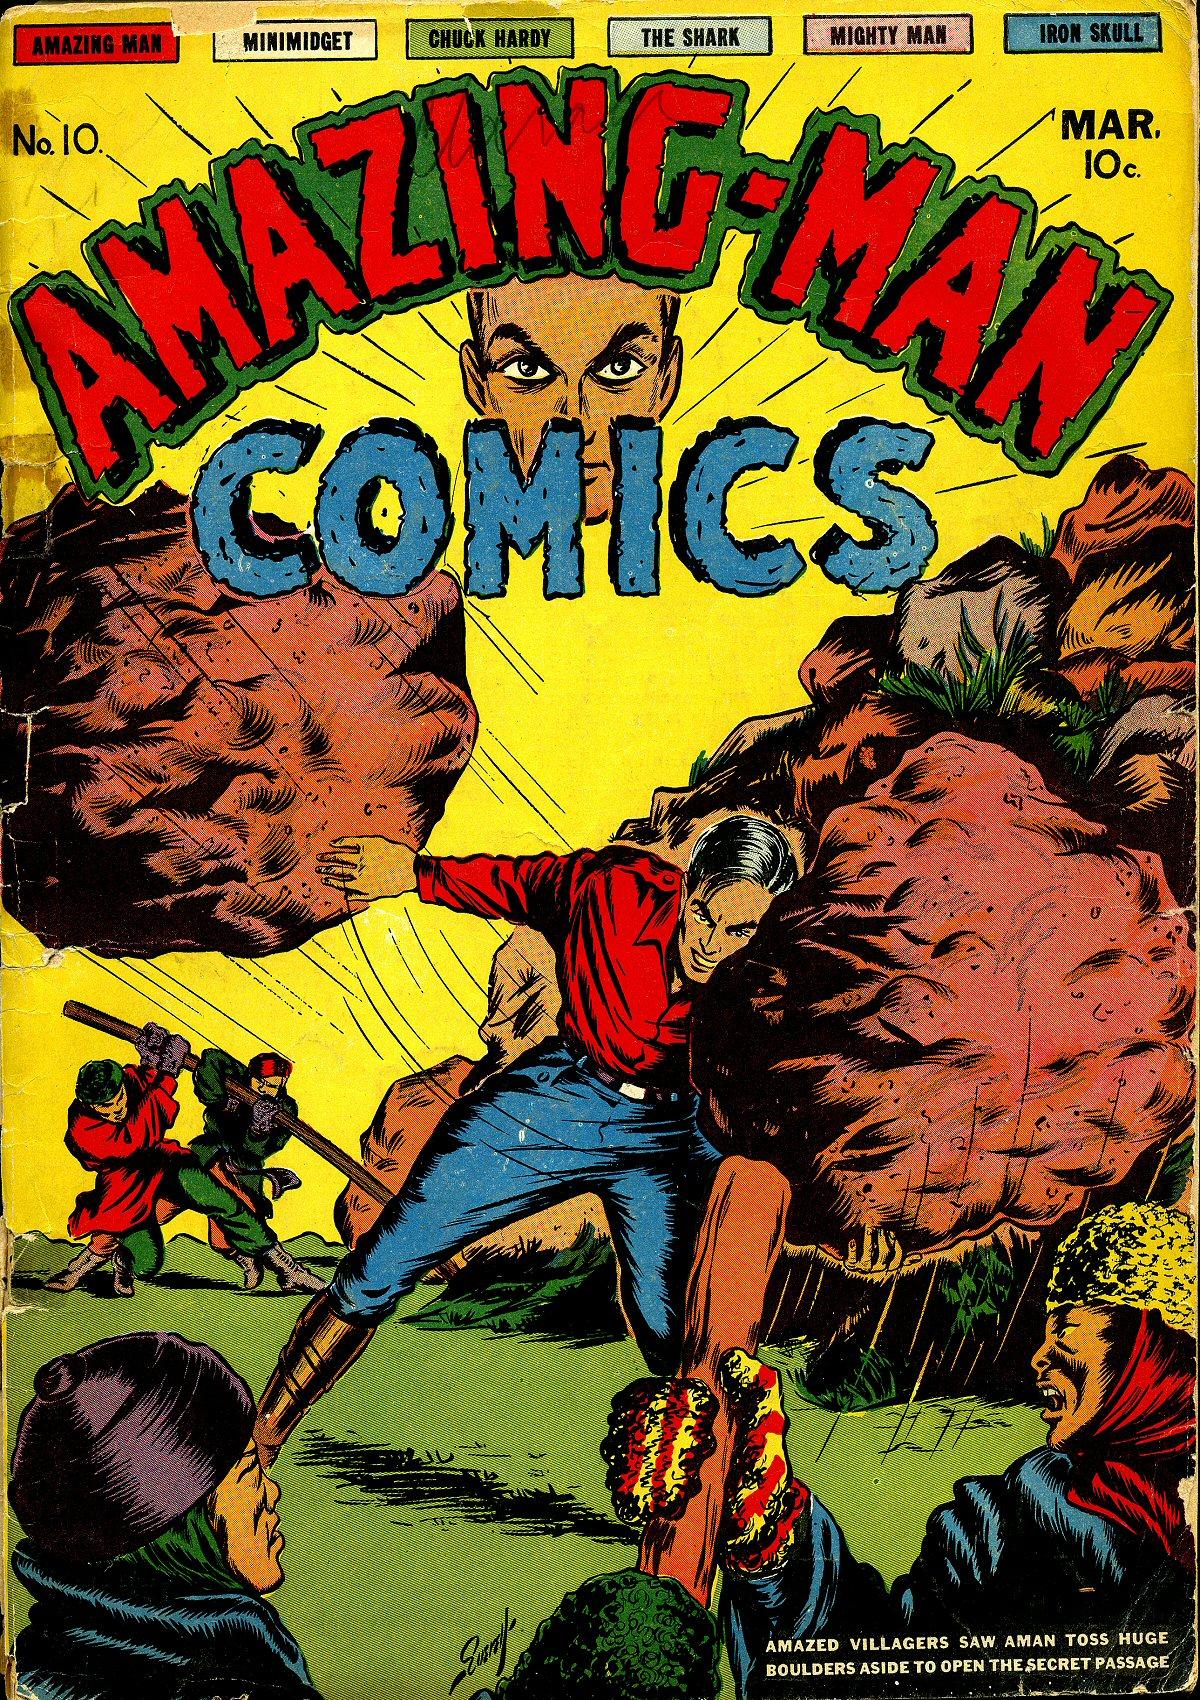 Read online Amazing Man Comics comic -  Issue #10 - 2